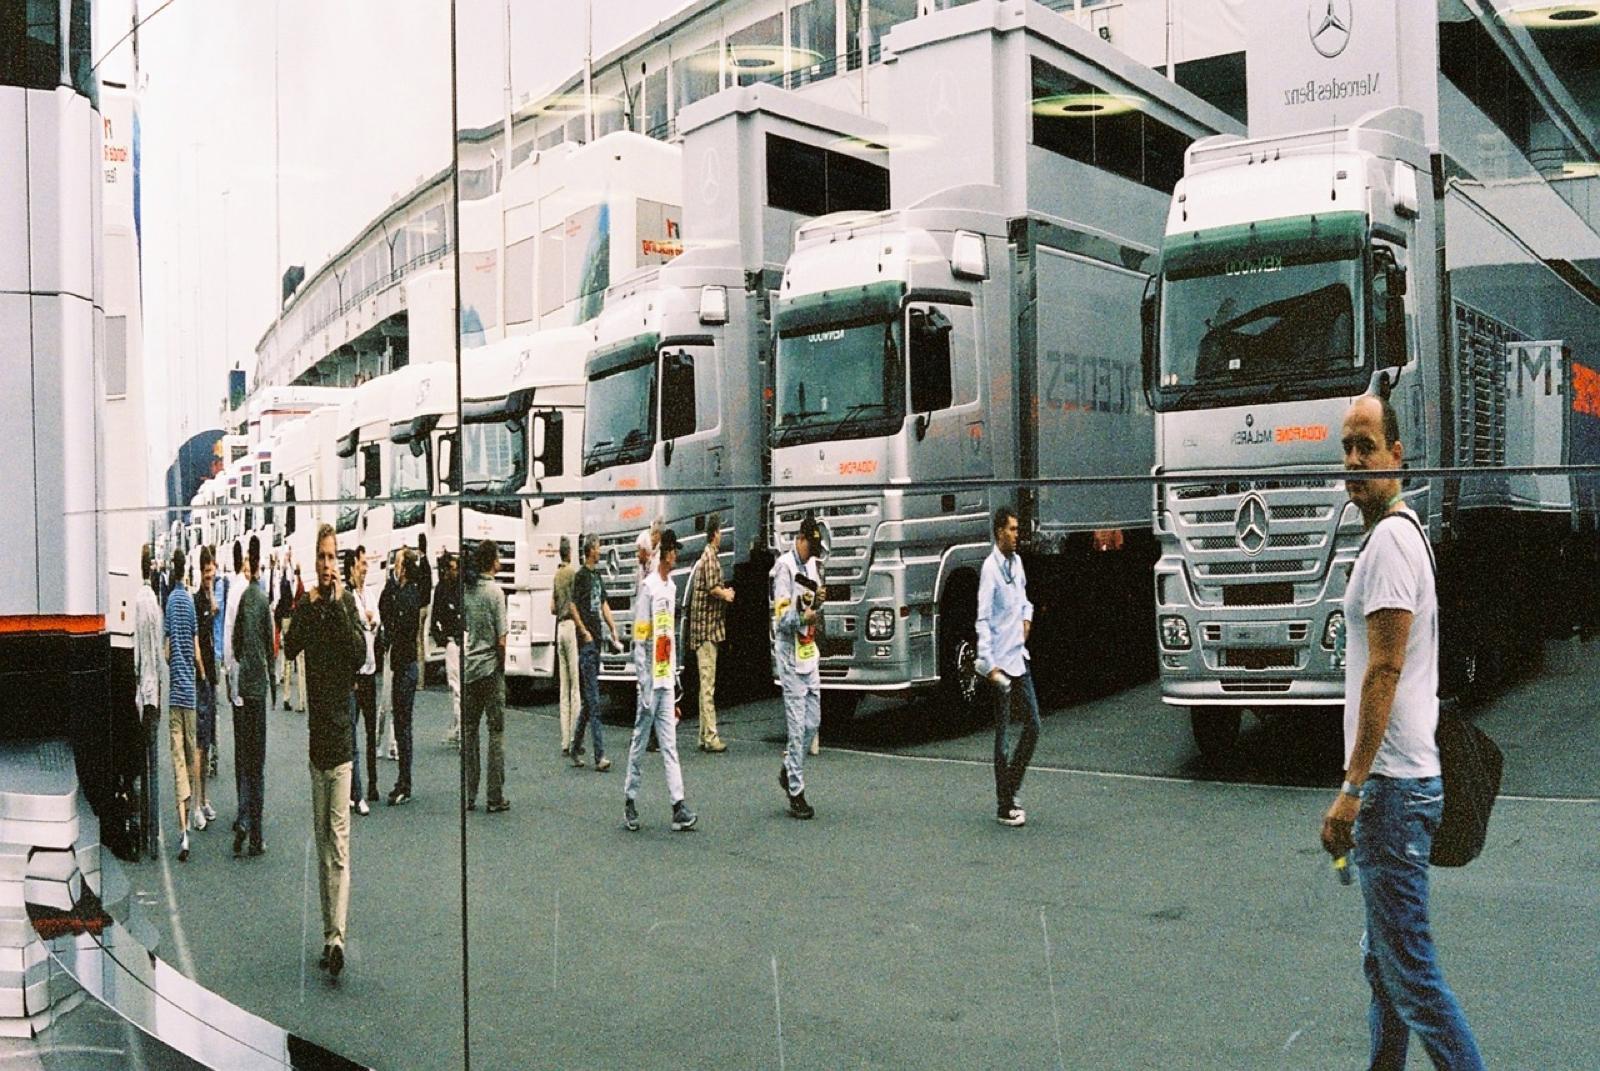 Nürburgring - Auf dem Weg - 20052015 - full